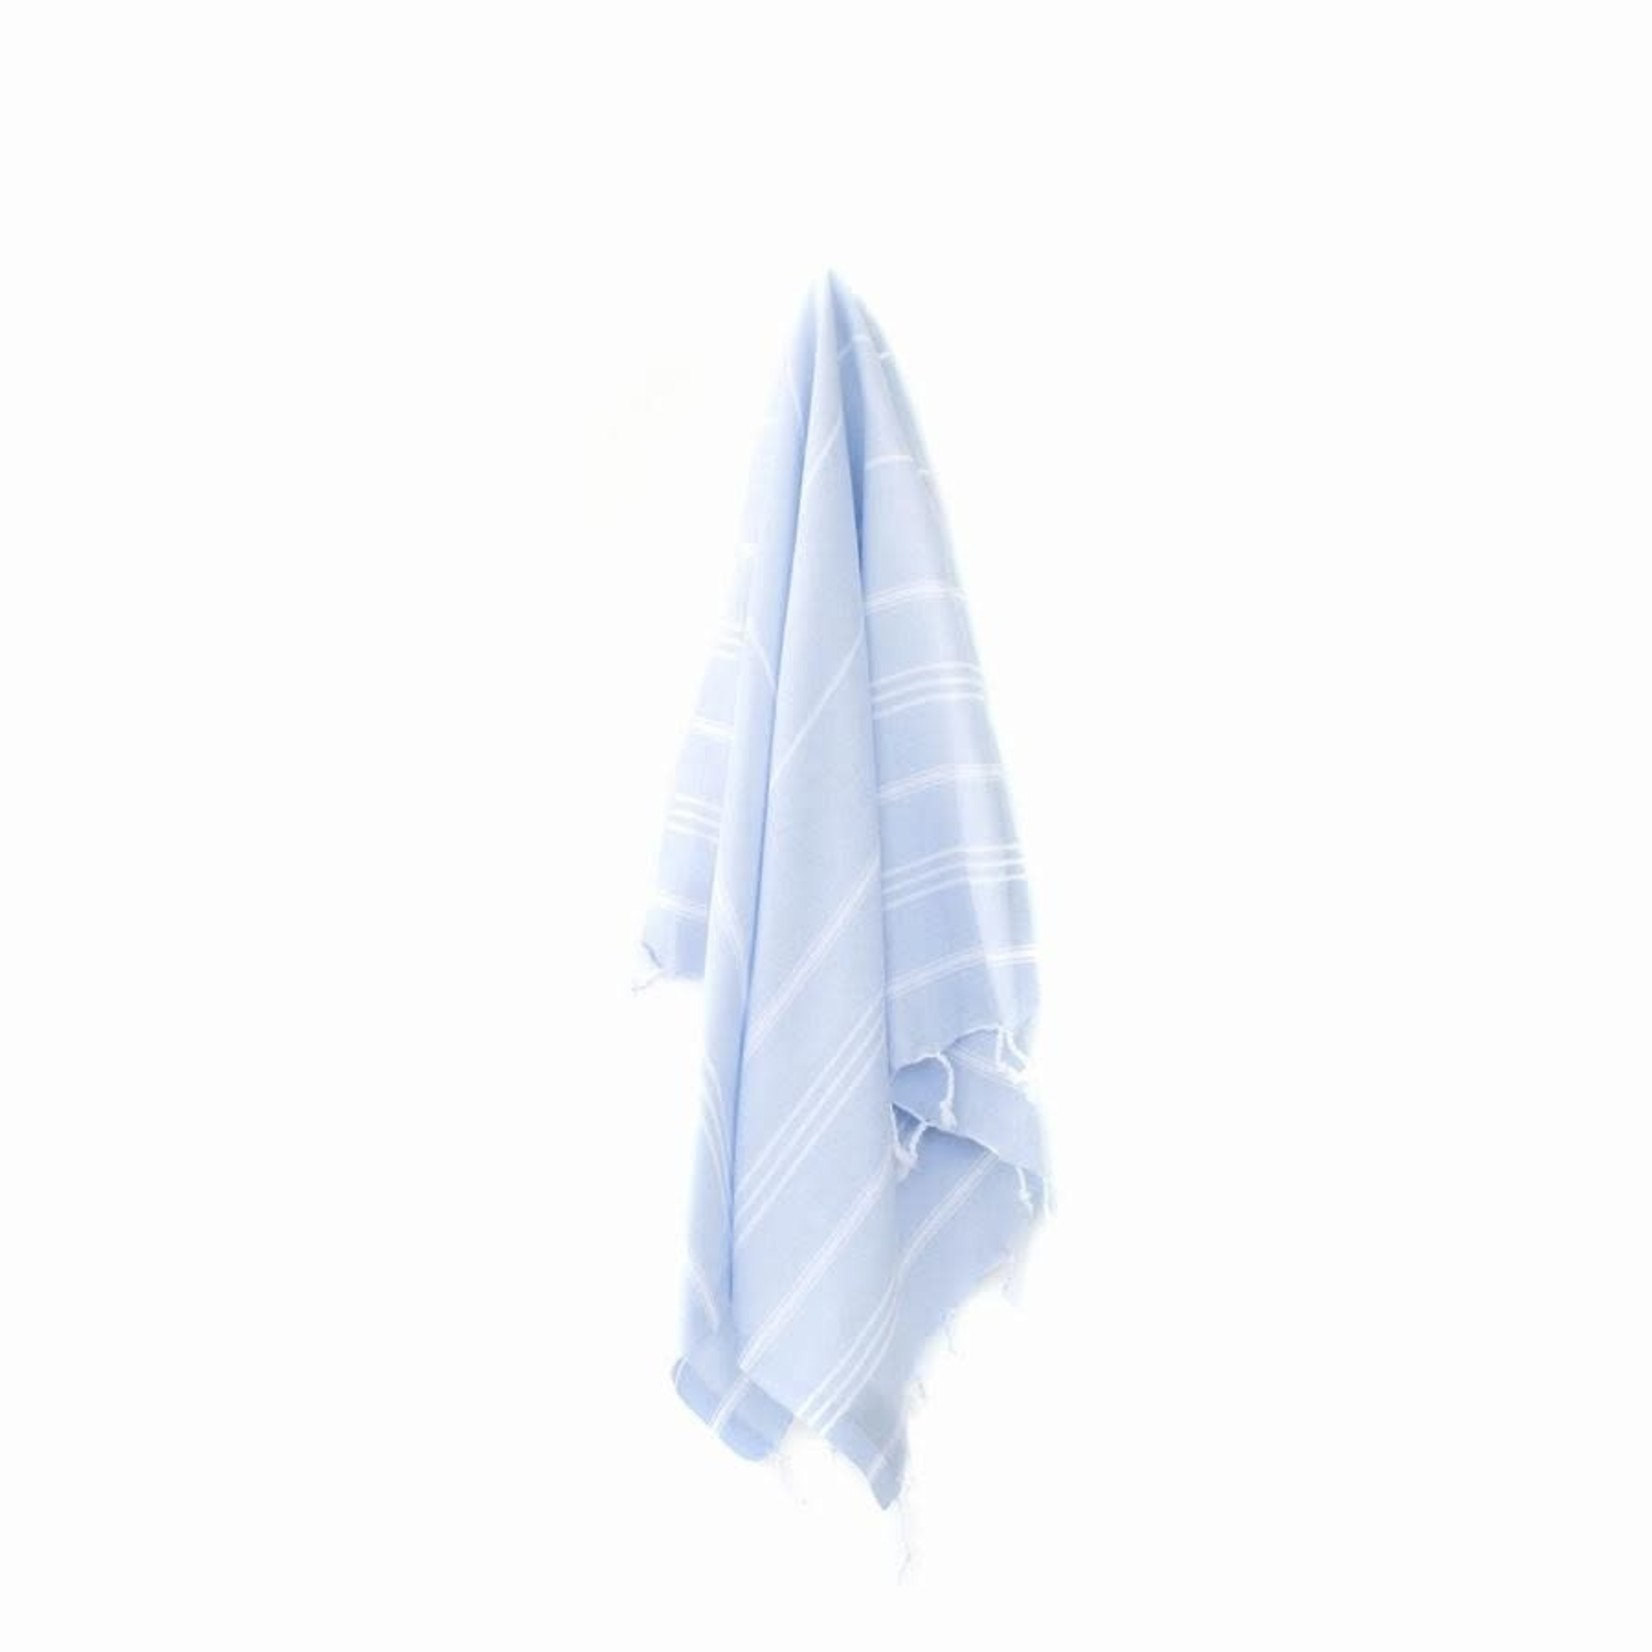 MARIN SMALL TOWEL - POWDER BLUE